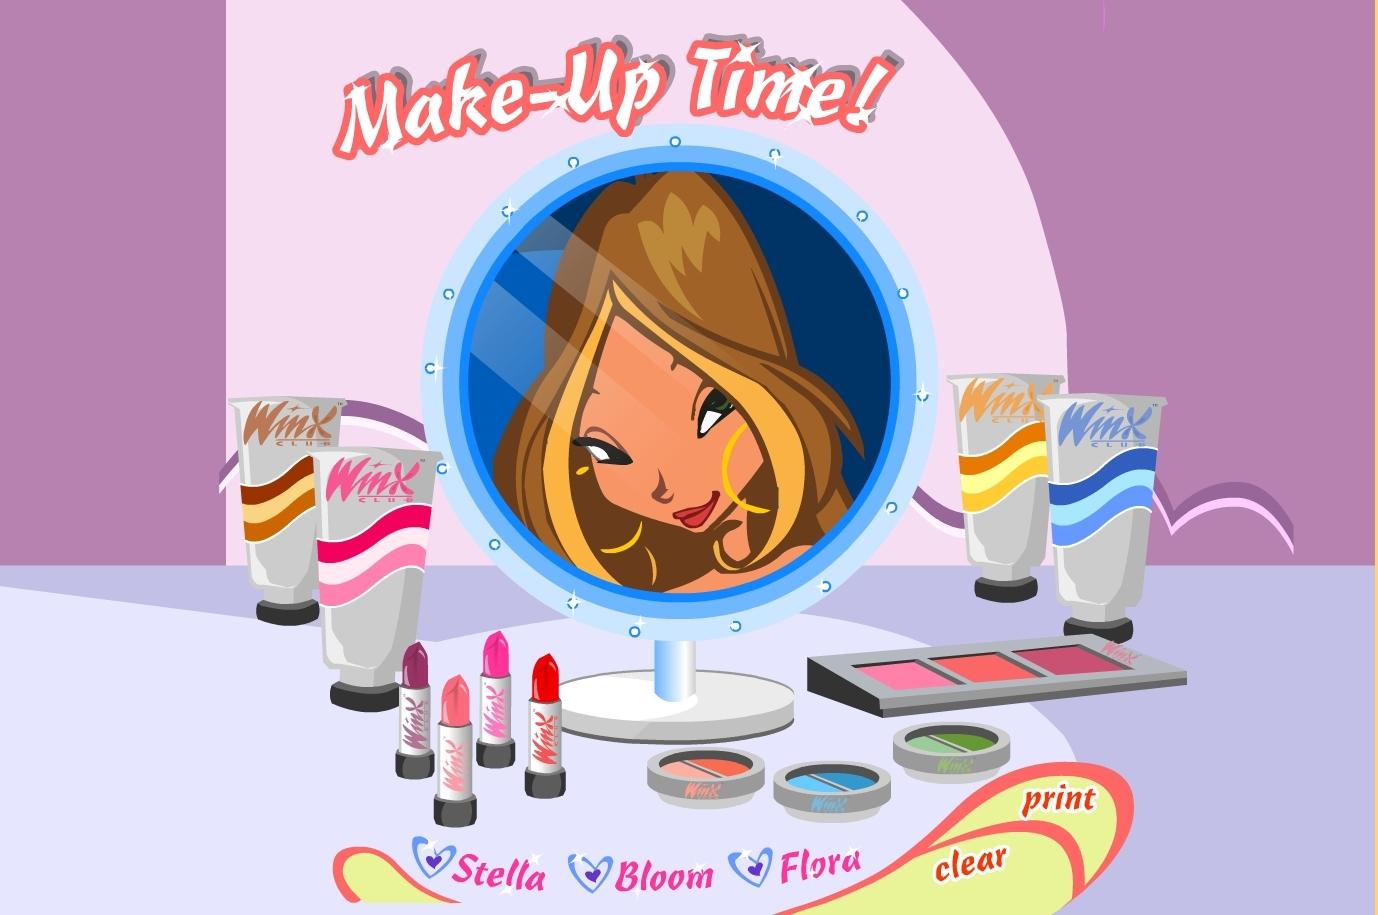 jeu winx maquillage gratuit en ligne. Black Bedroom Furniture Sets. Home Design Ideas